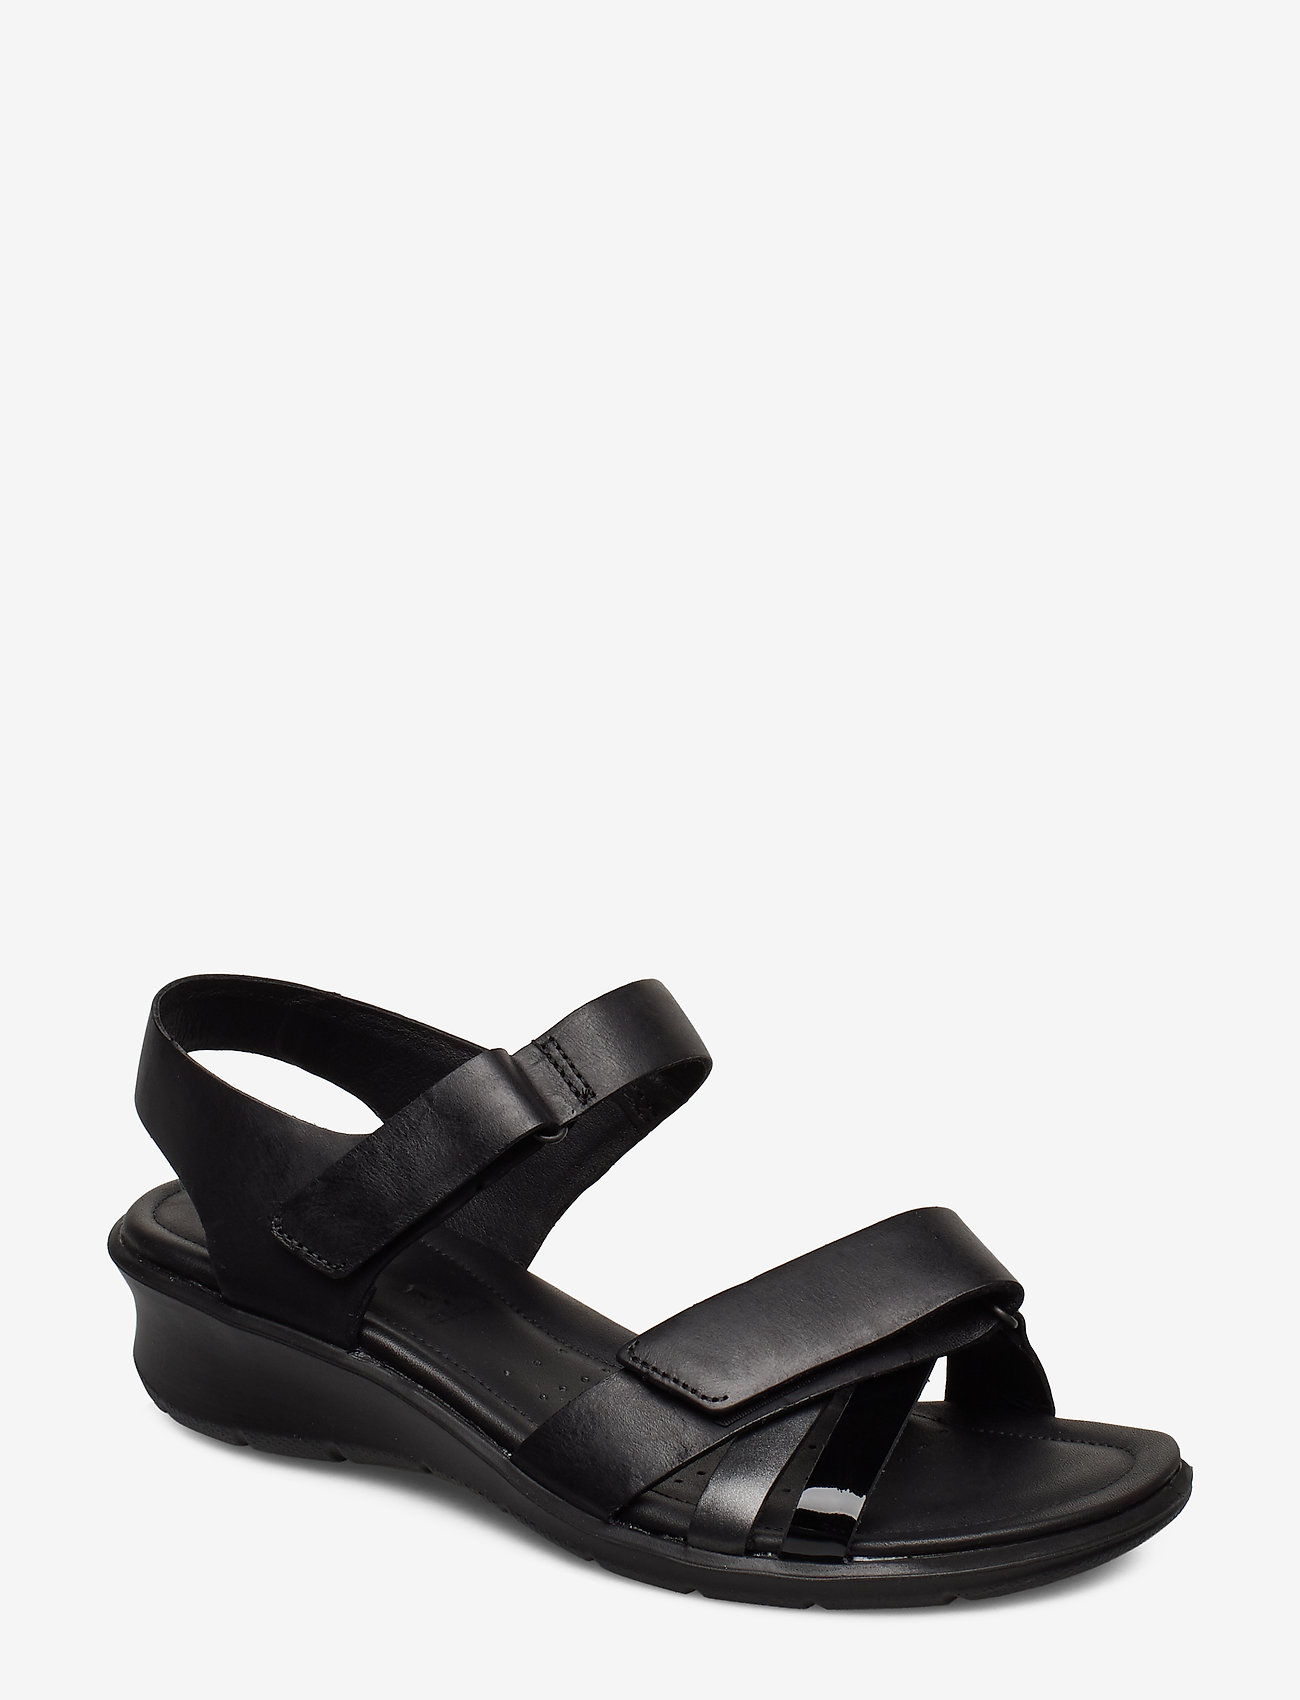 ECCO - FELICIA SANDAL - flat sandals - black/black dark shadow metallic/black - 0